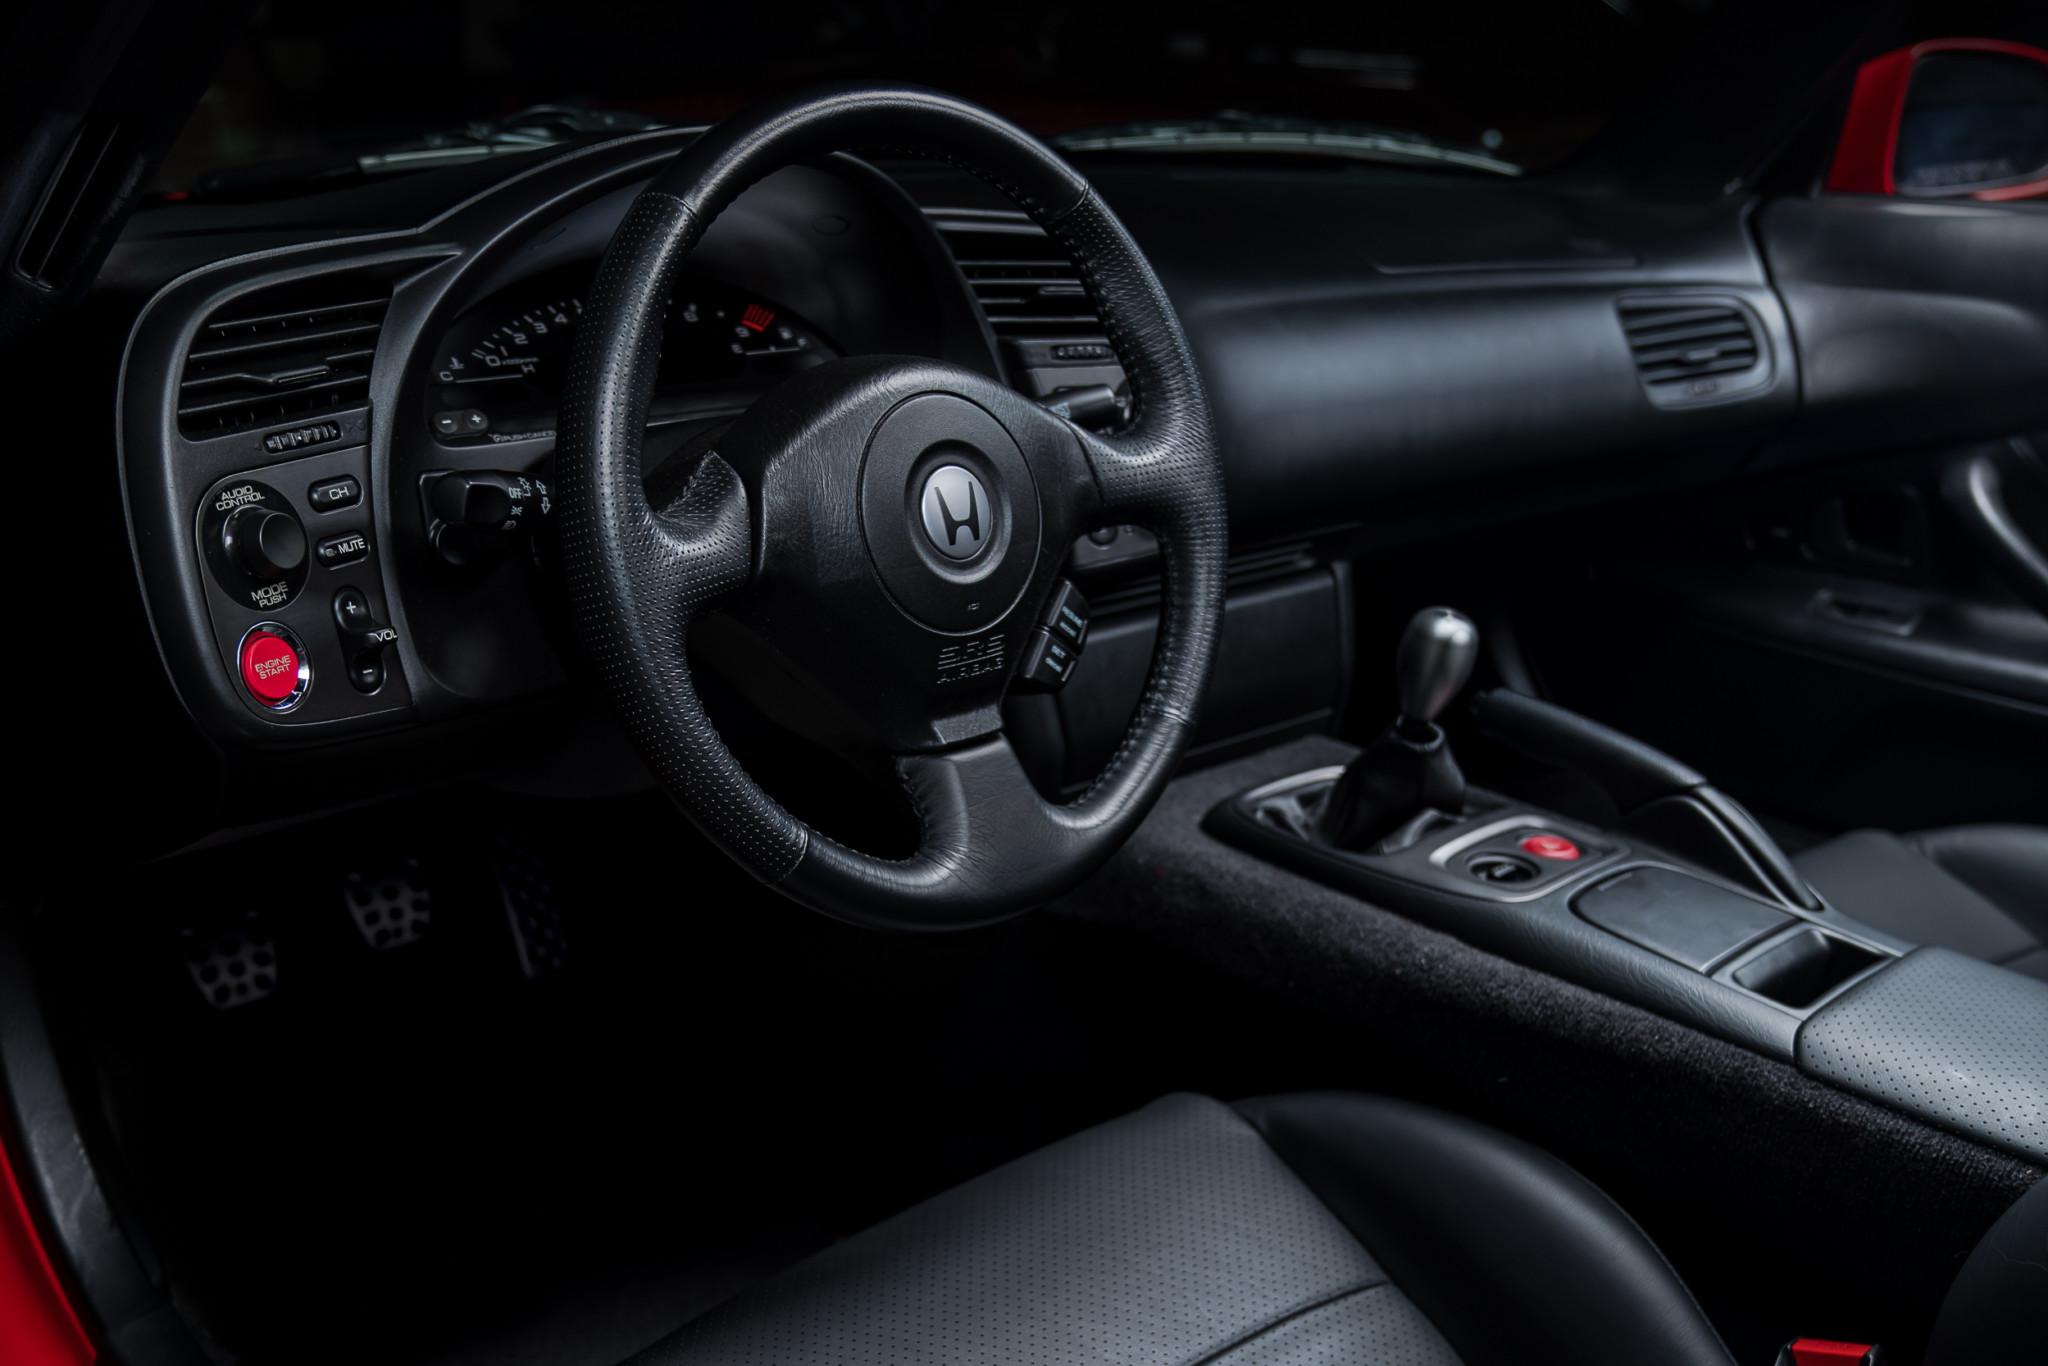 2000 Honda S2000 steering wheel dash